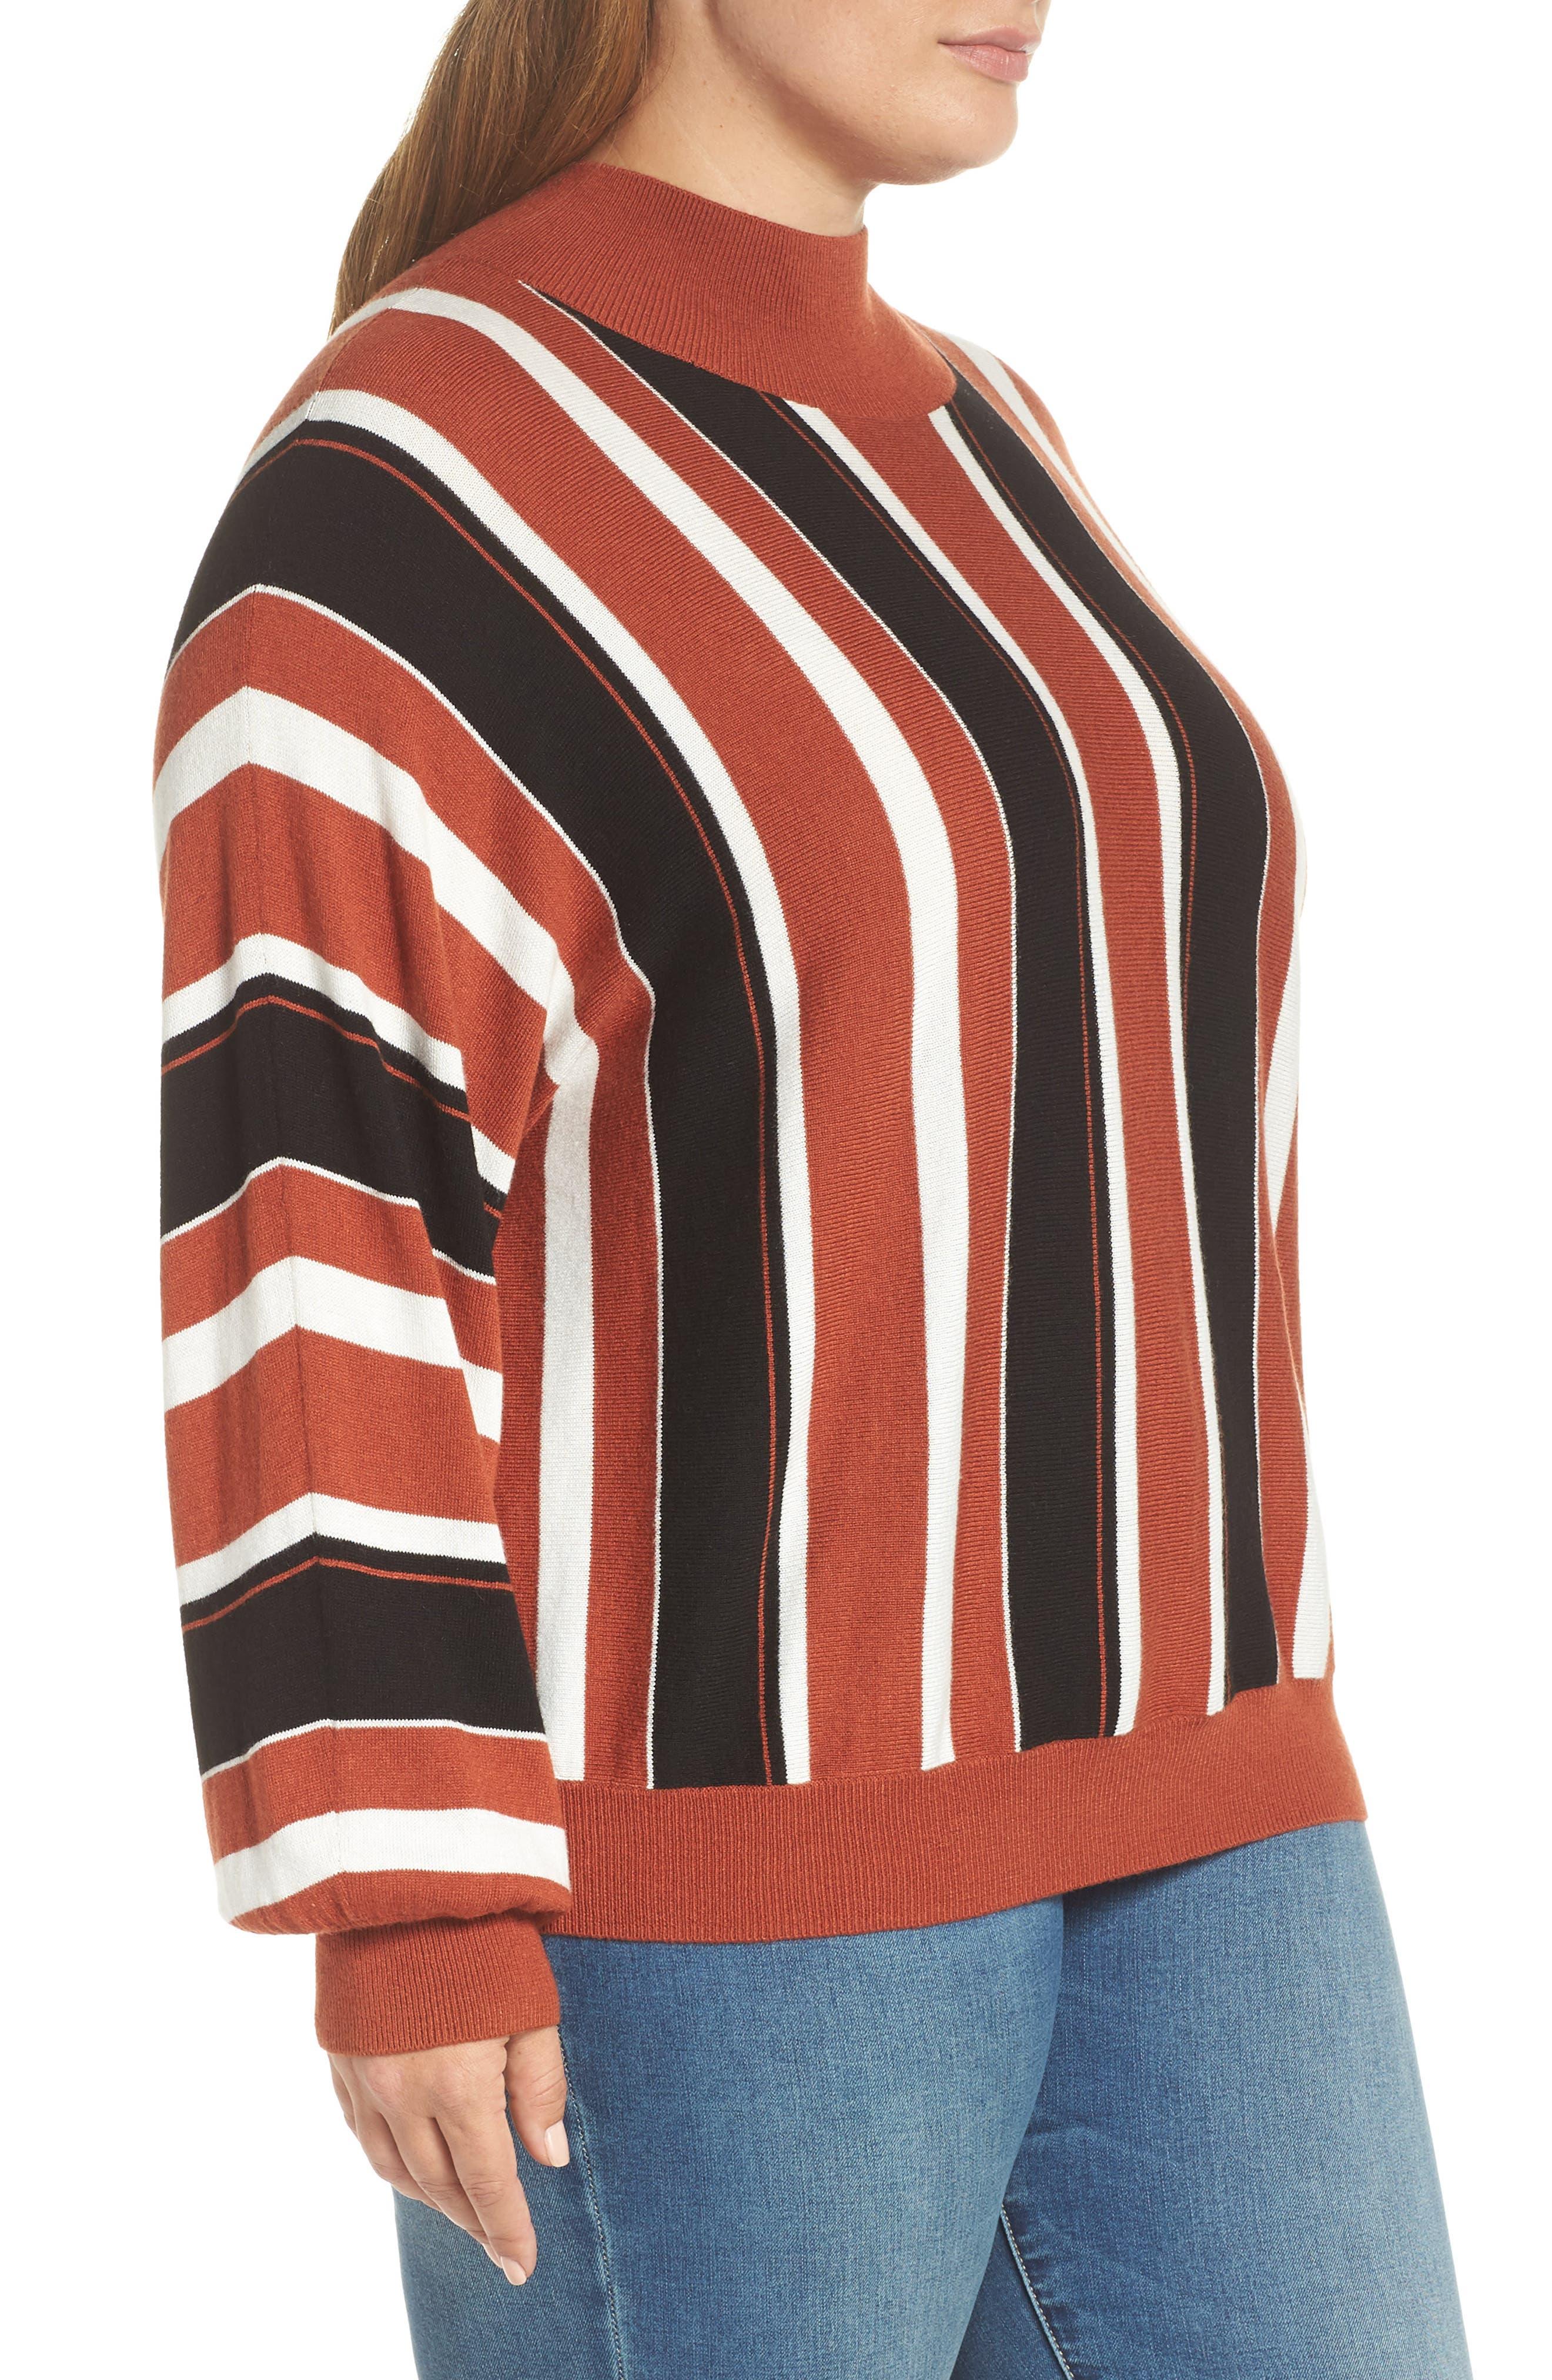 Stripe Dolman Sleeve Sweater,                             Alternate thumbnail 9, color,                             210